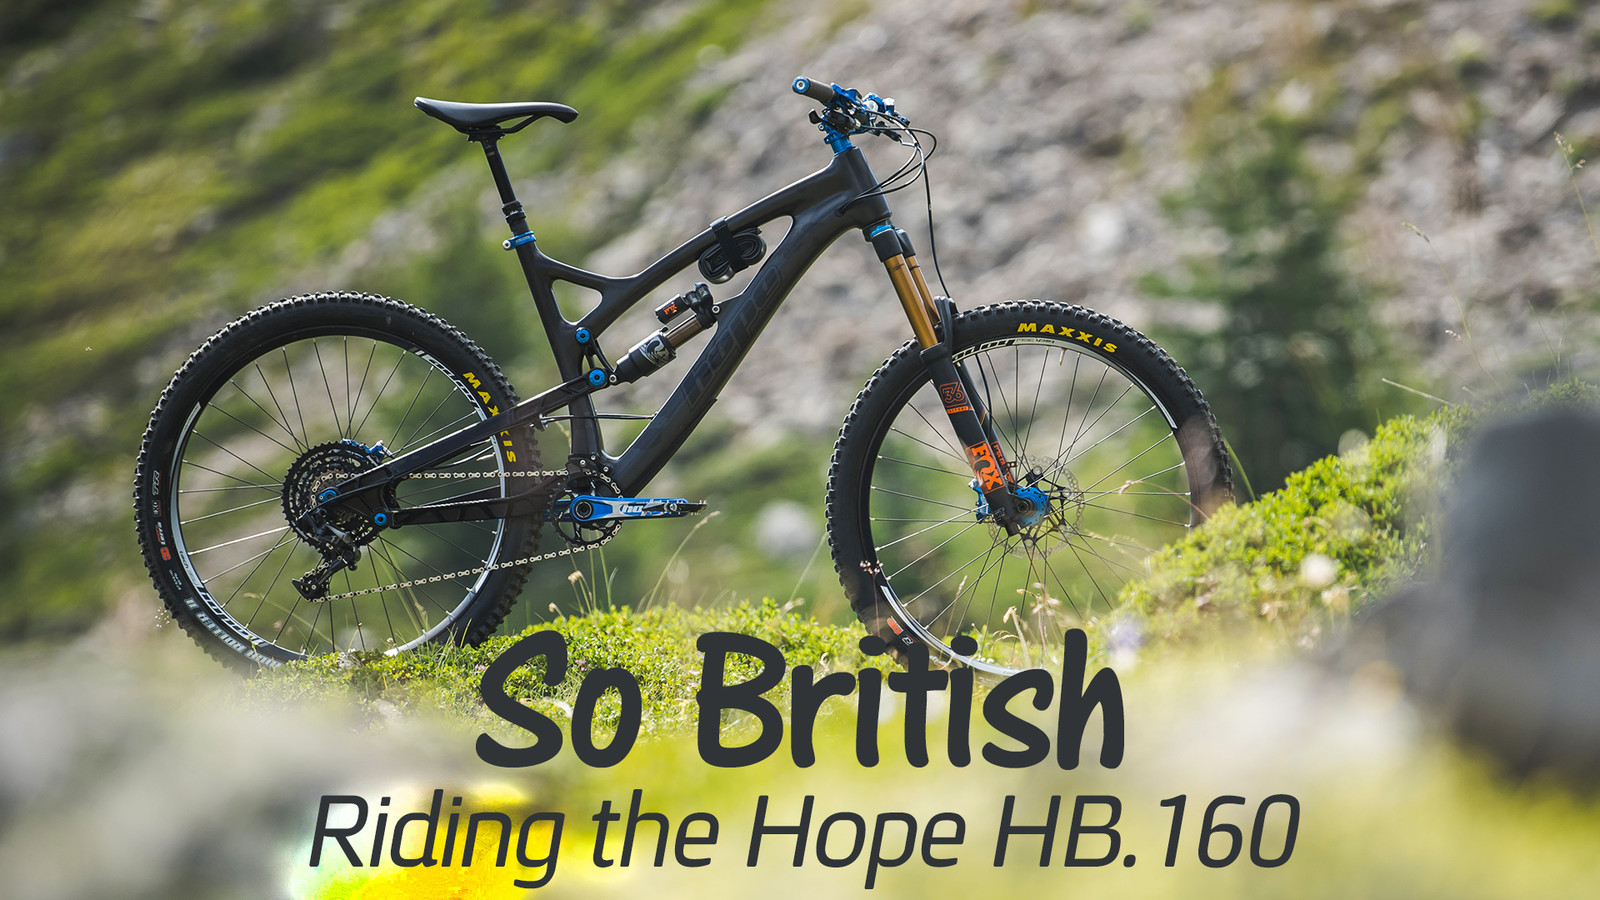 So British | Riding the Hope HB.160